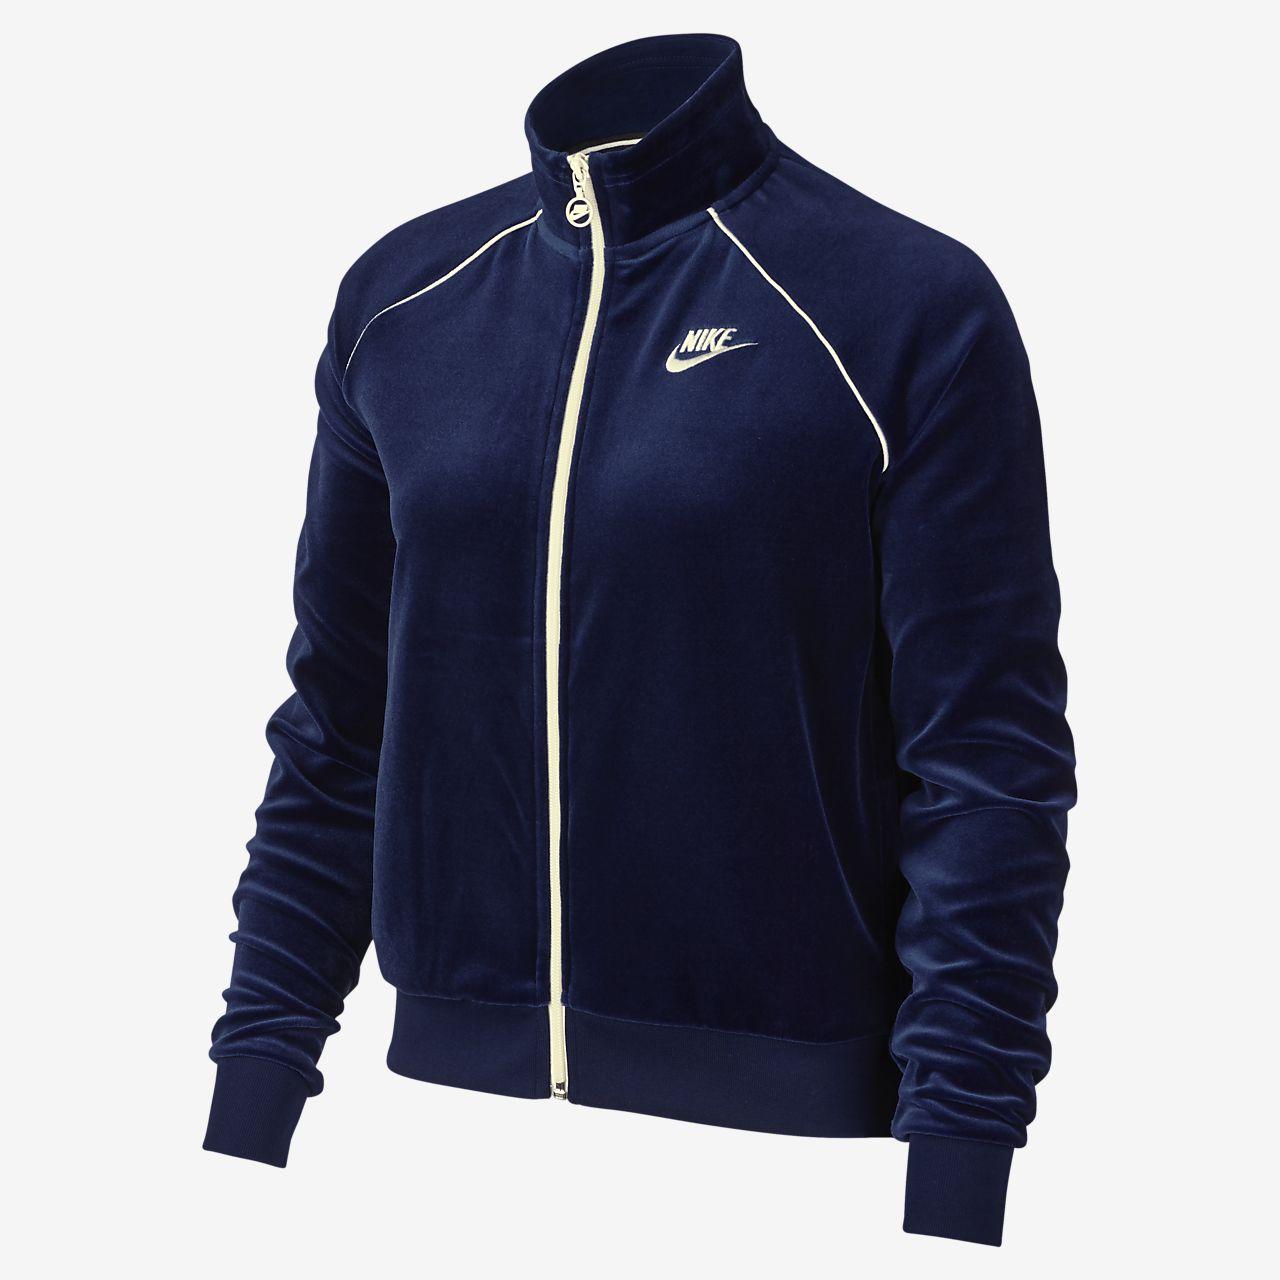 online retailer 075e9 6eaca ... Veste de survêtement en velours Nike Sportswear pour Femme